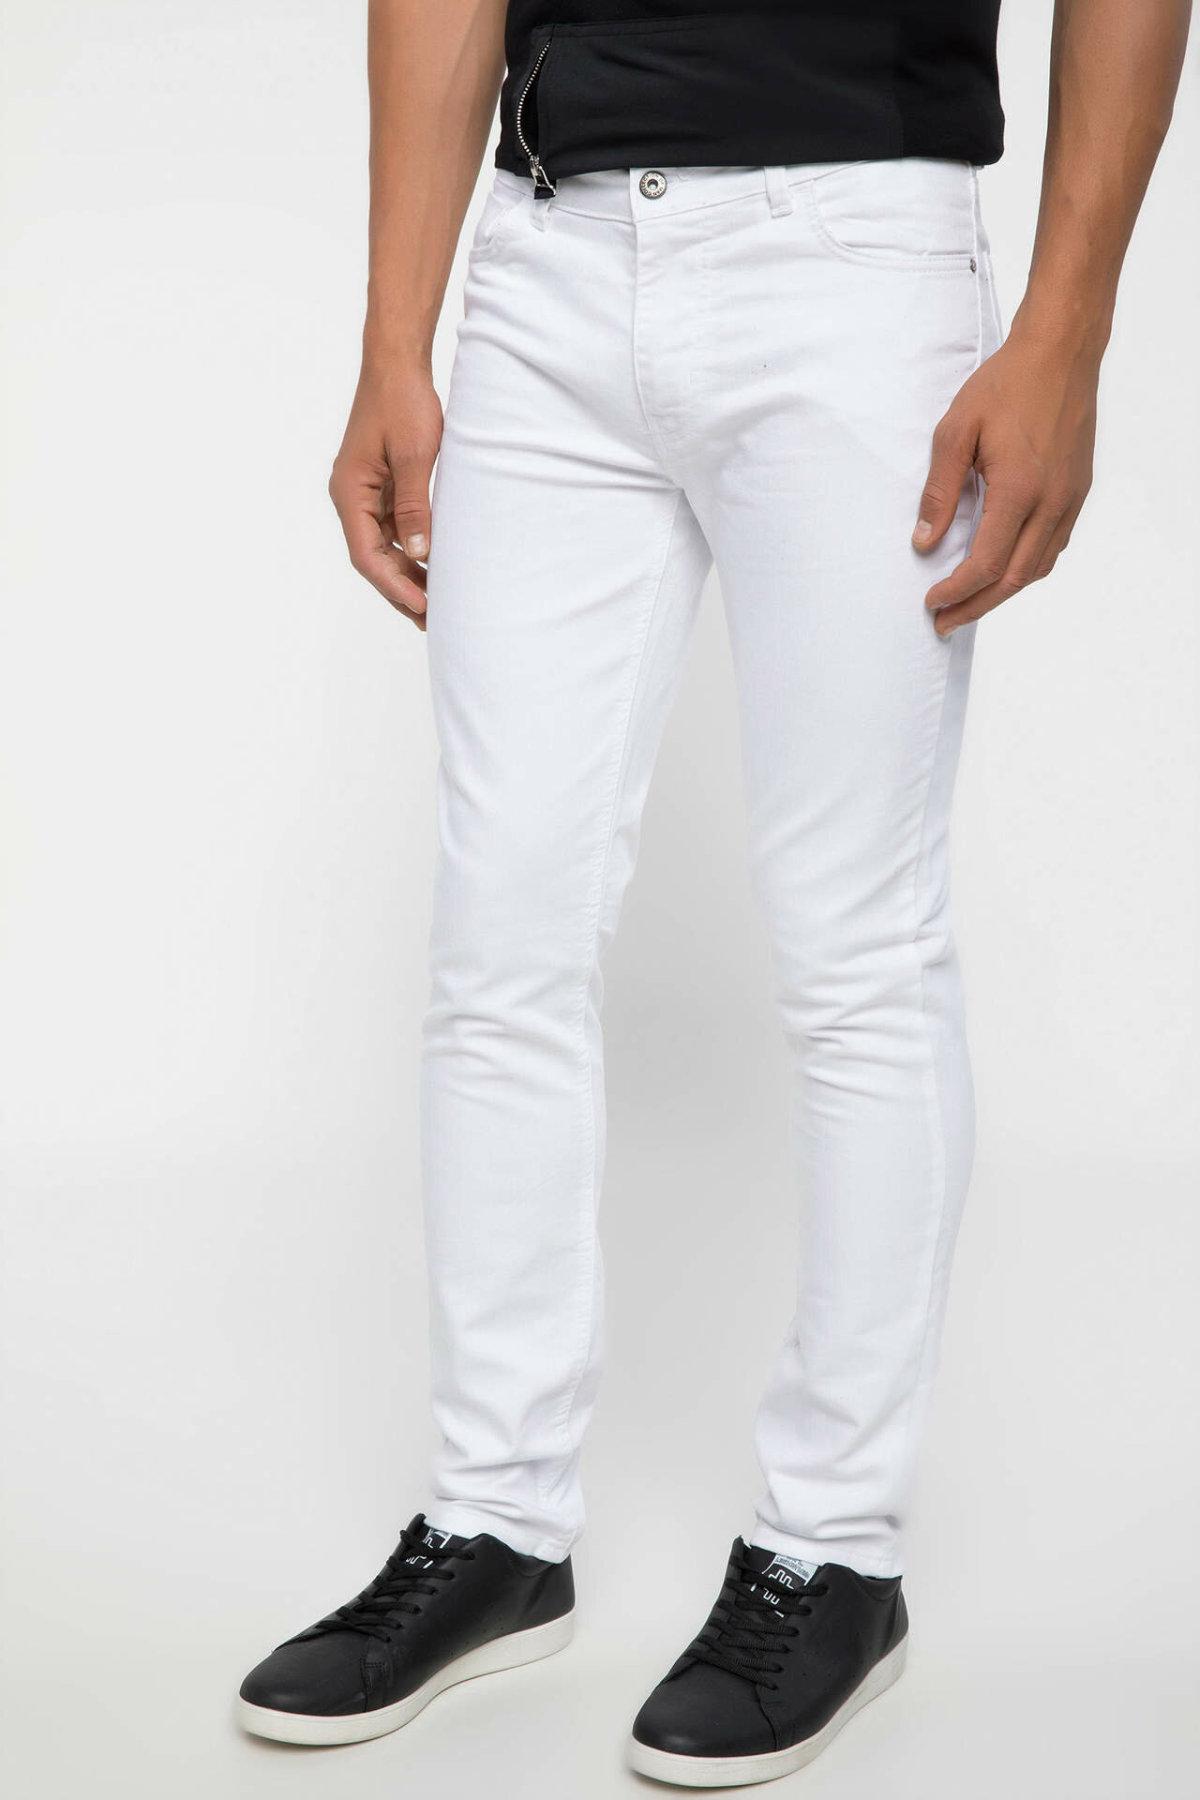 DeFacto Man Summer Breathable White Denim Jeans Men Casual Straight Denim Pants Male Mid-waist Strench Trousers-J6782AZ18SM